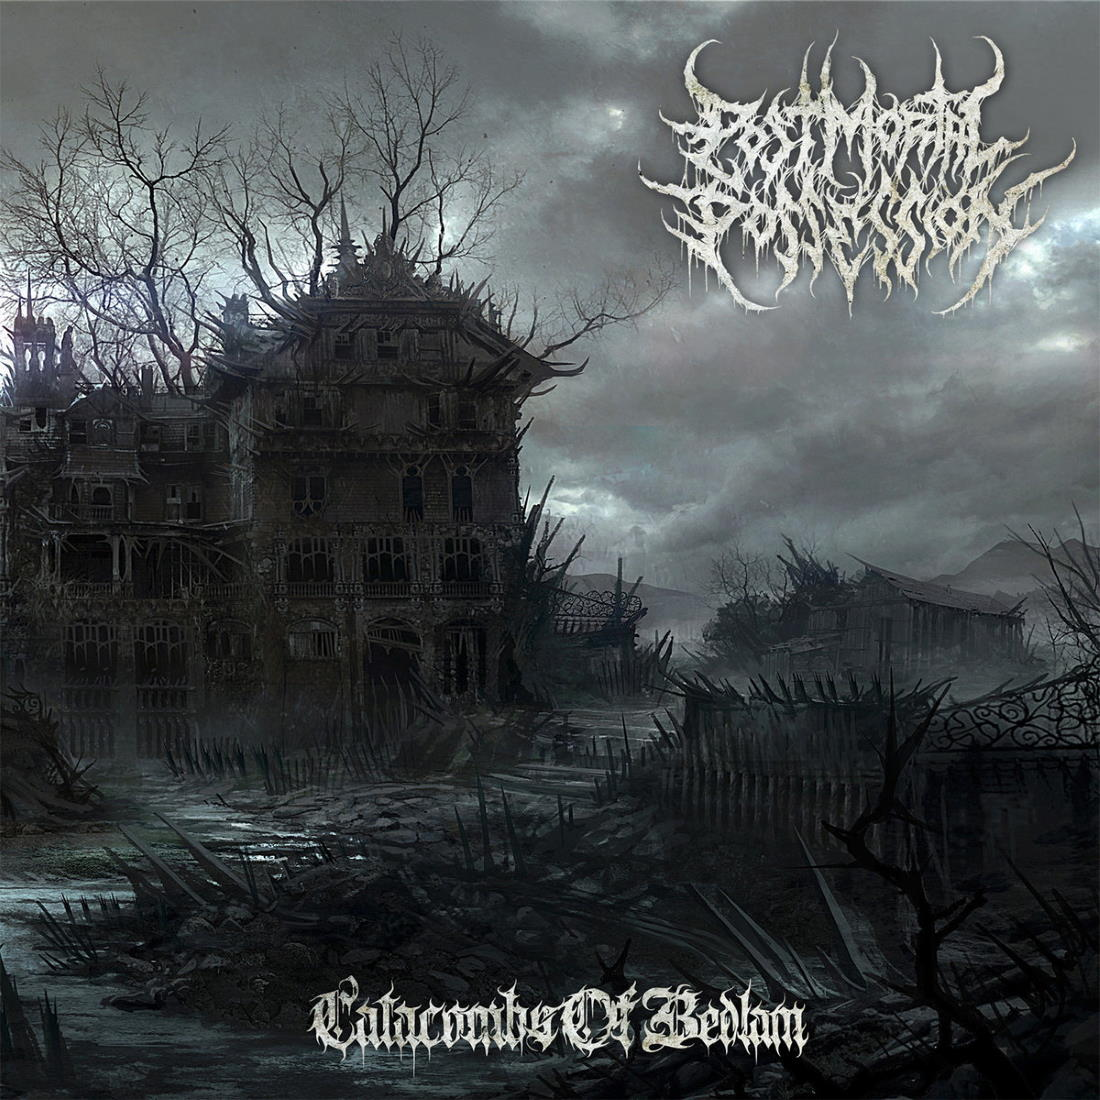 Post Mortal Possession - Catacombs of Bedlam